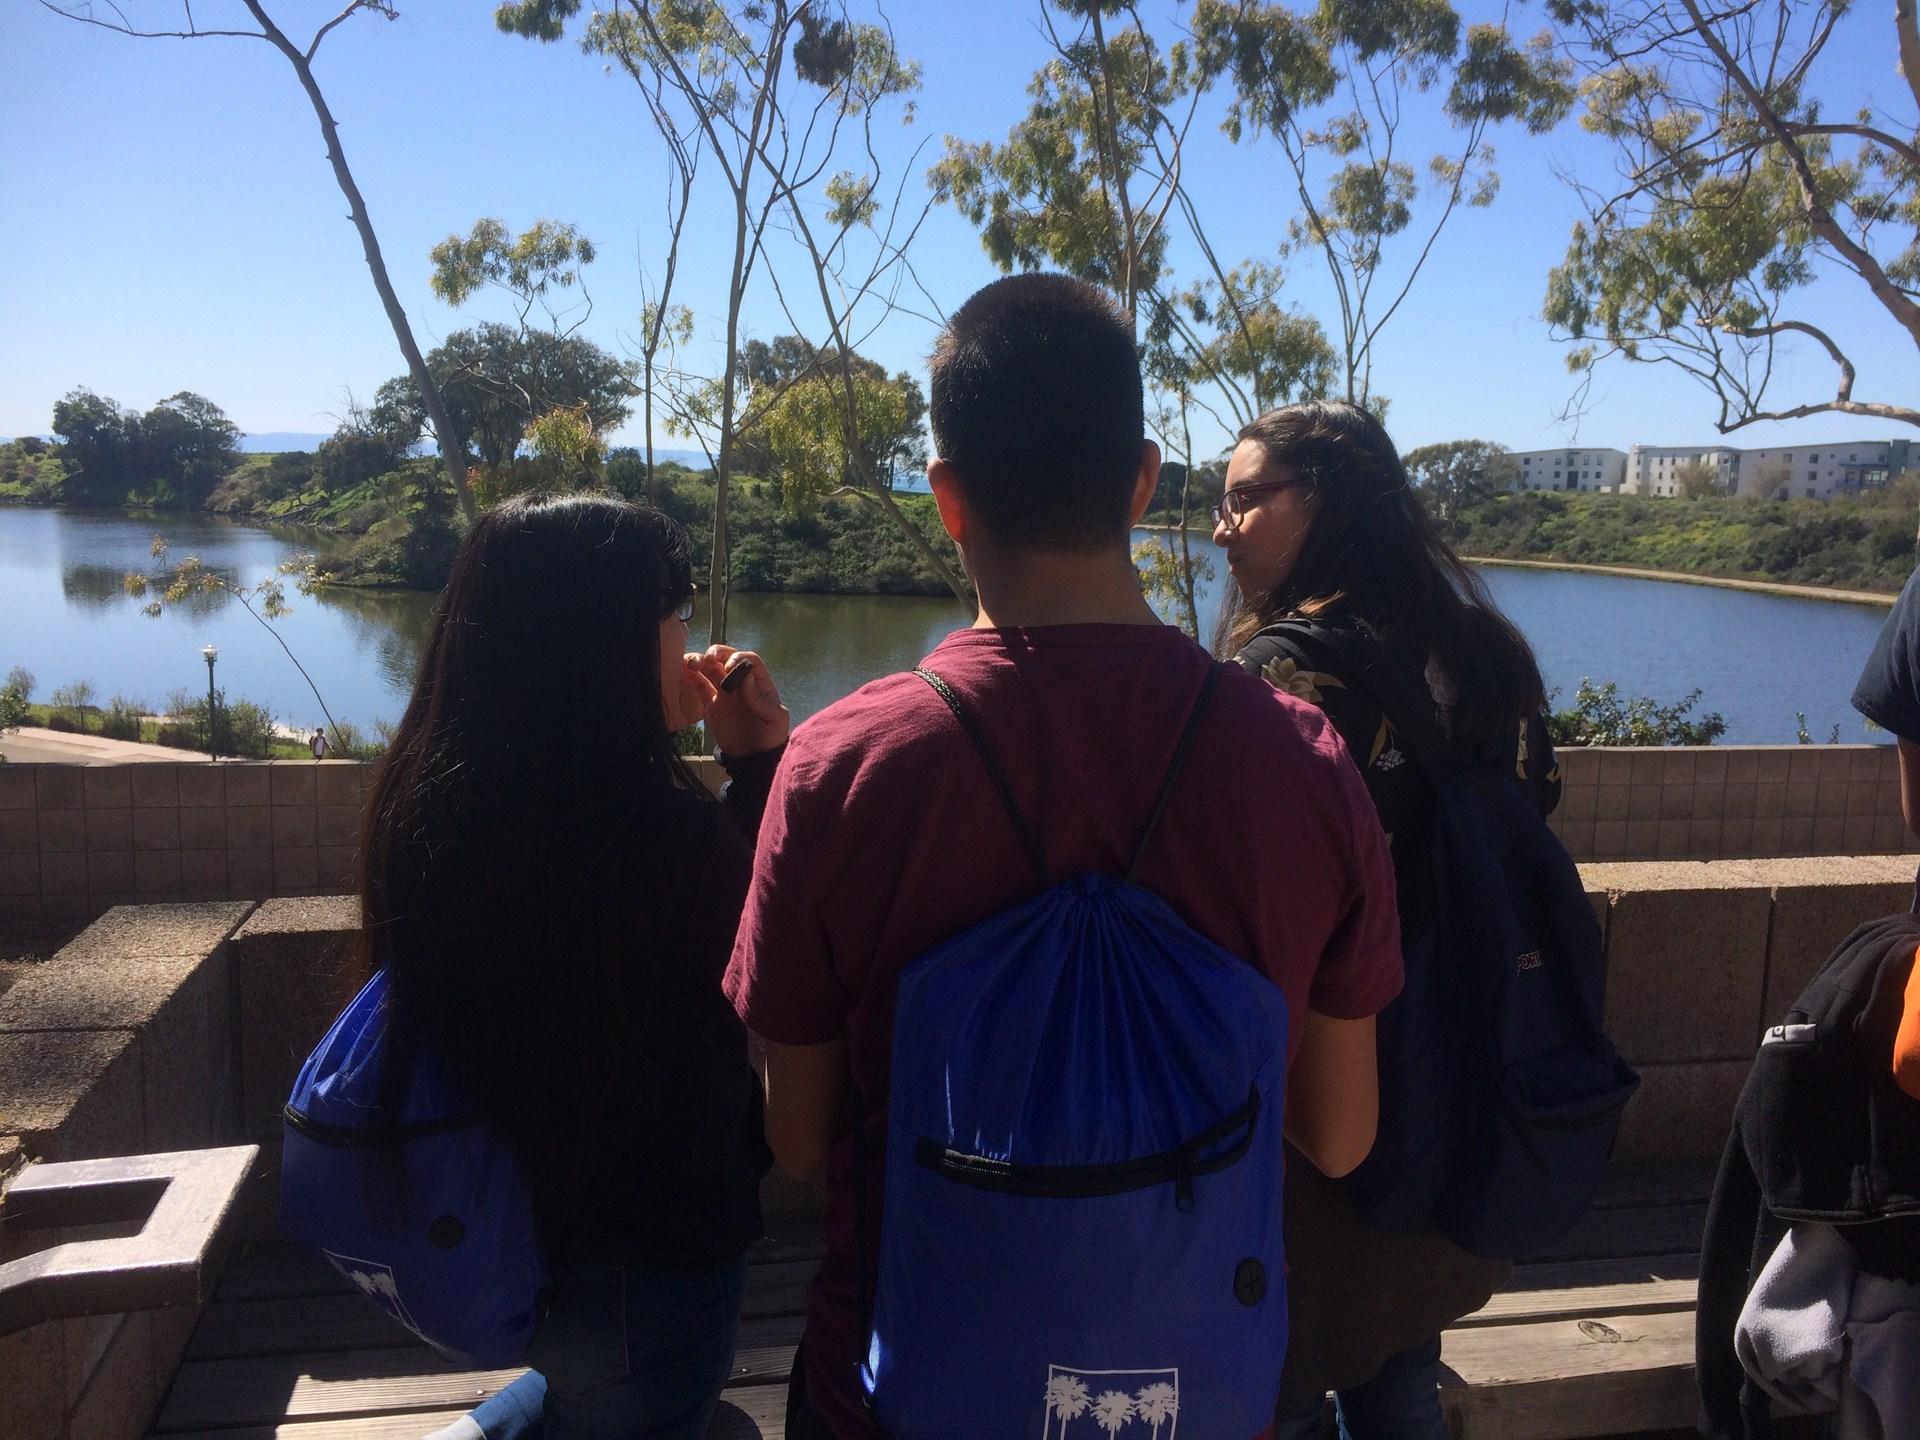 UCSB trip